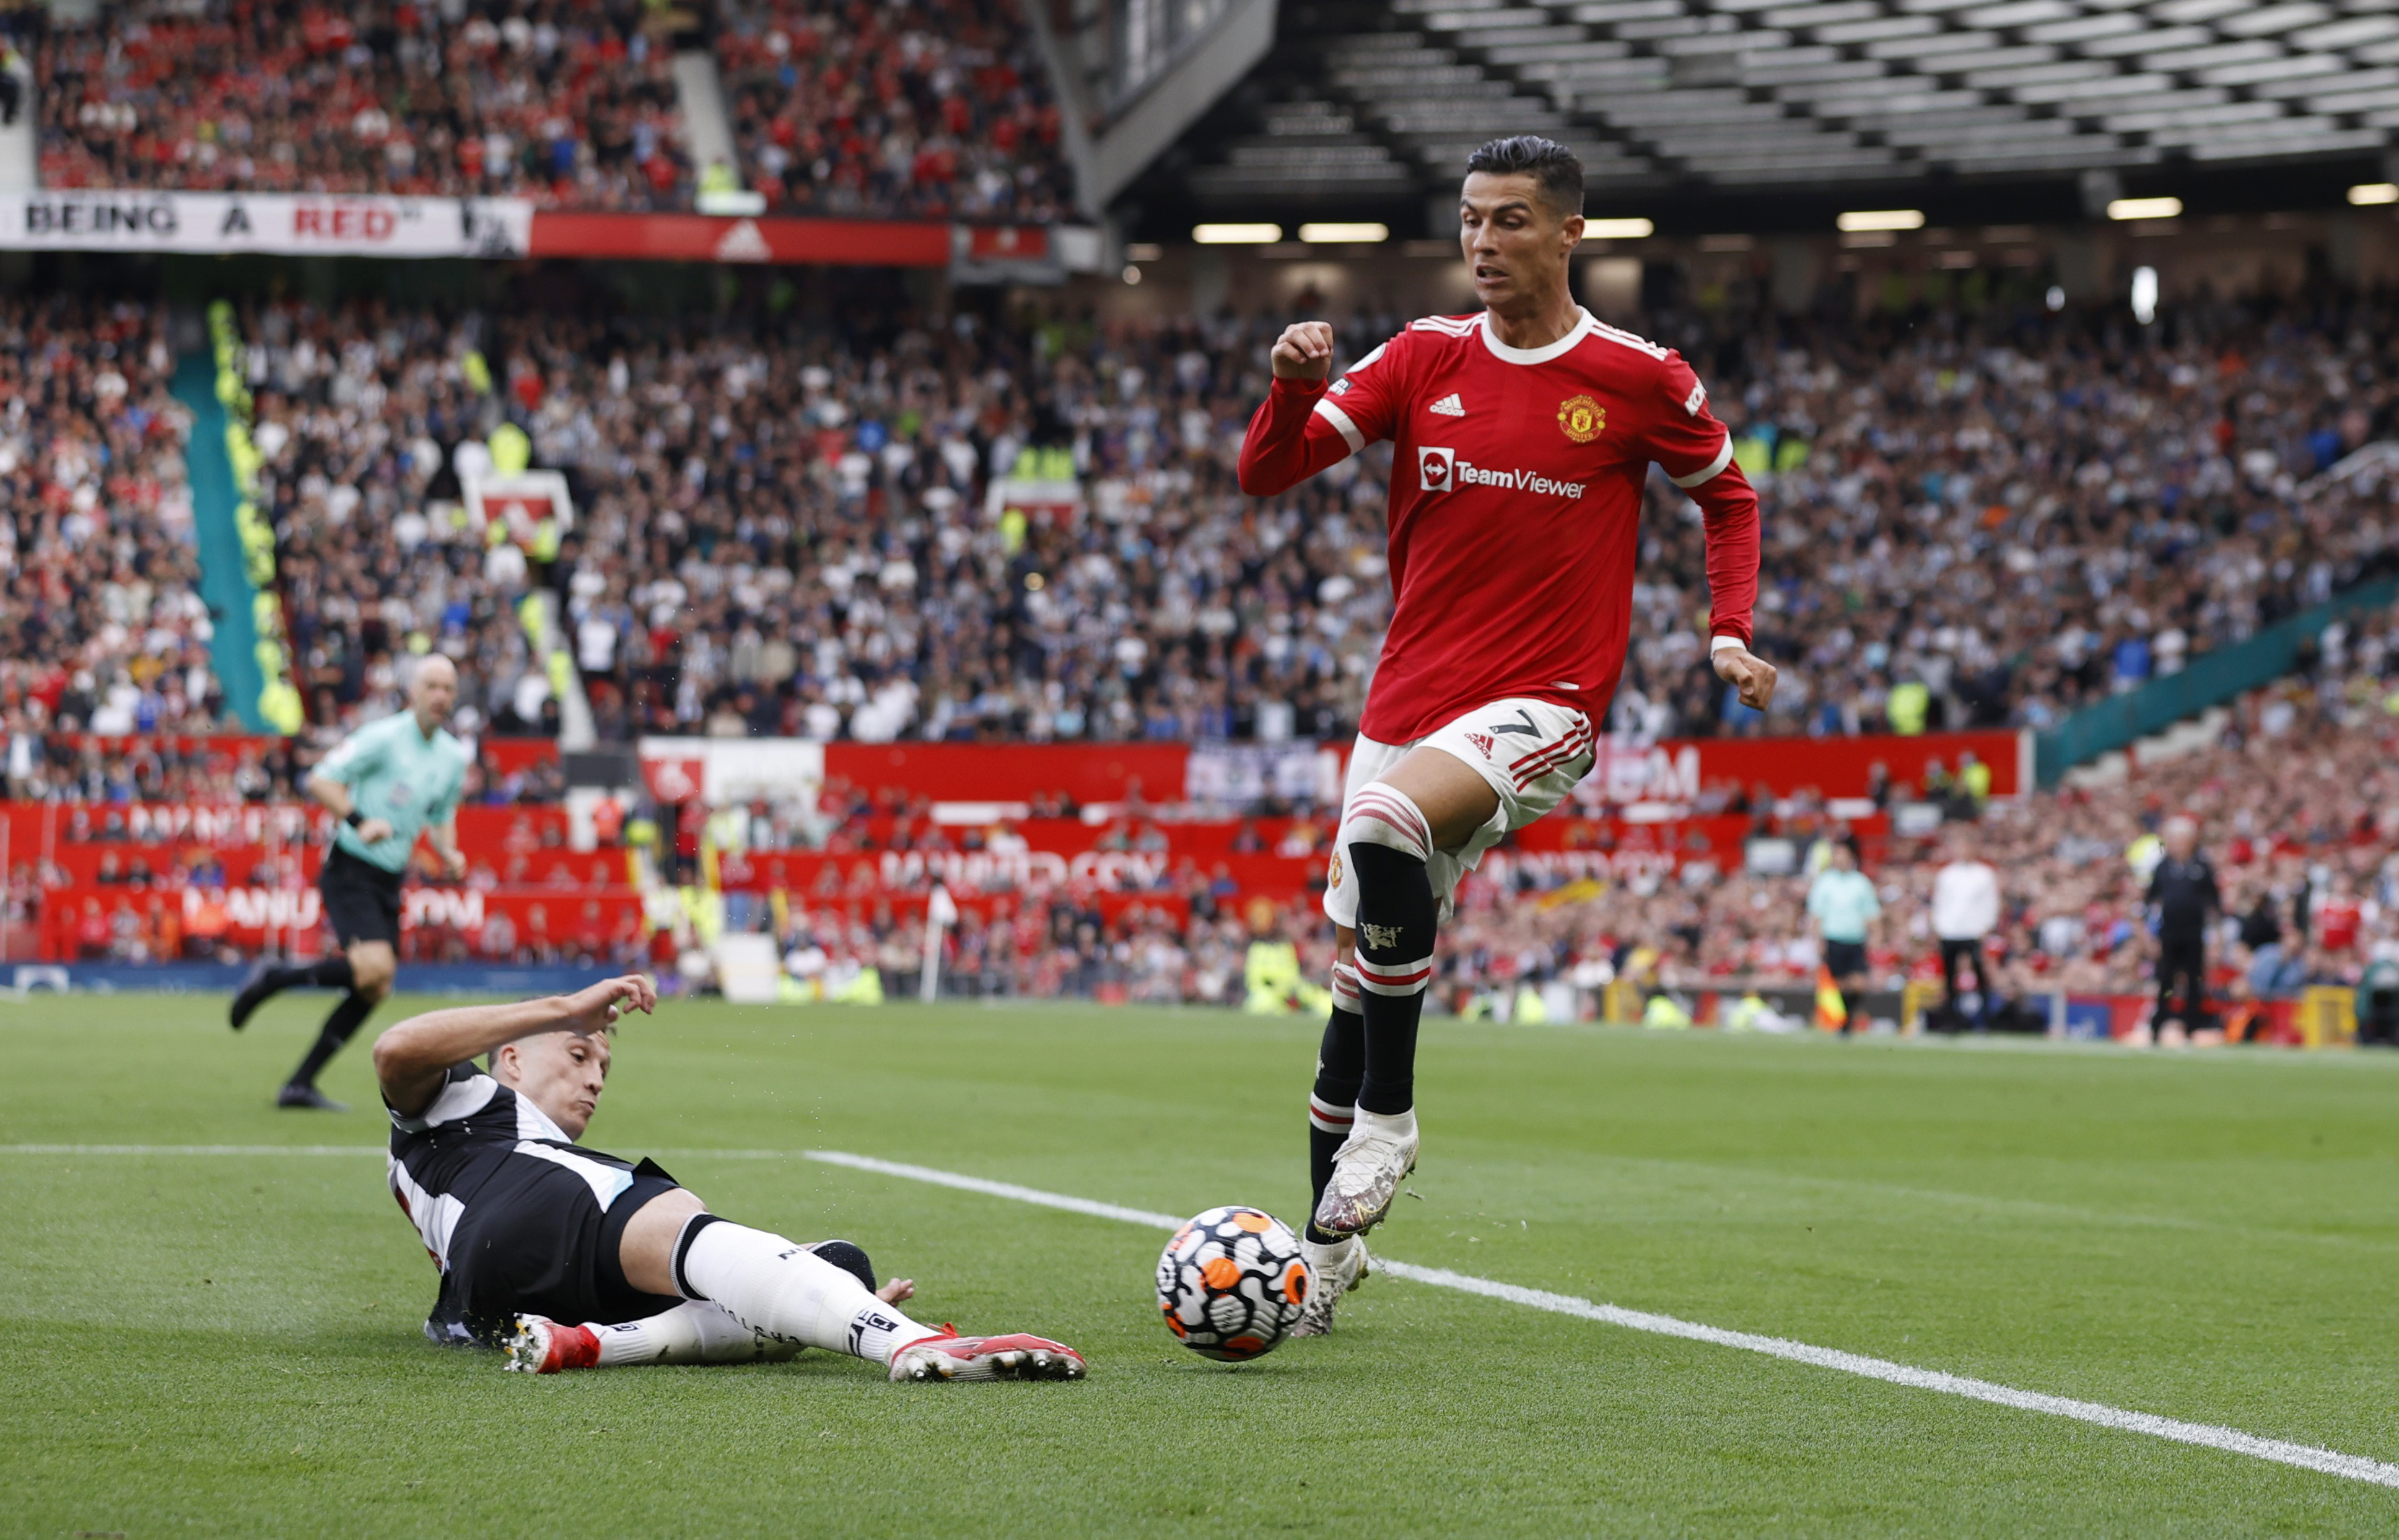 I was super nervous', says Ronaldo after memorable second debut at Man Utd    Reuters